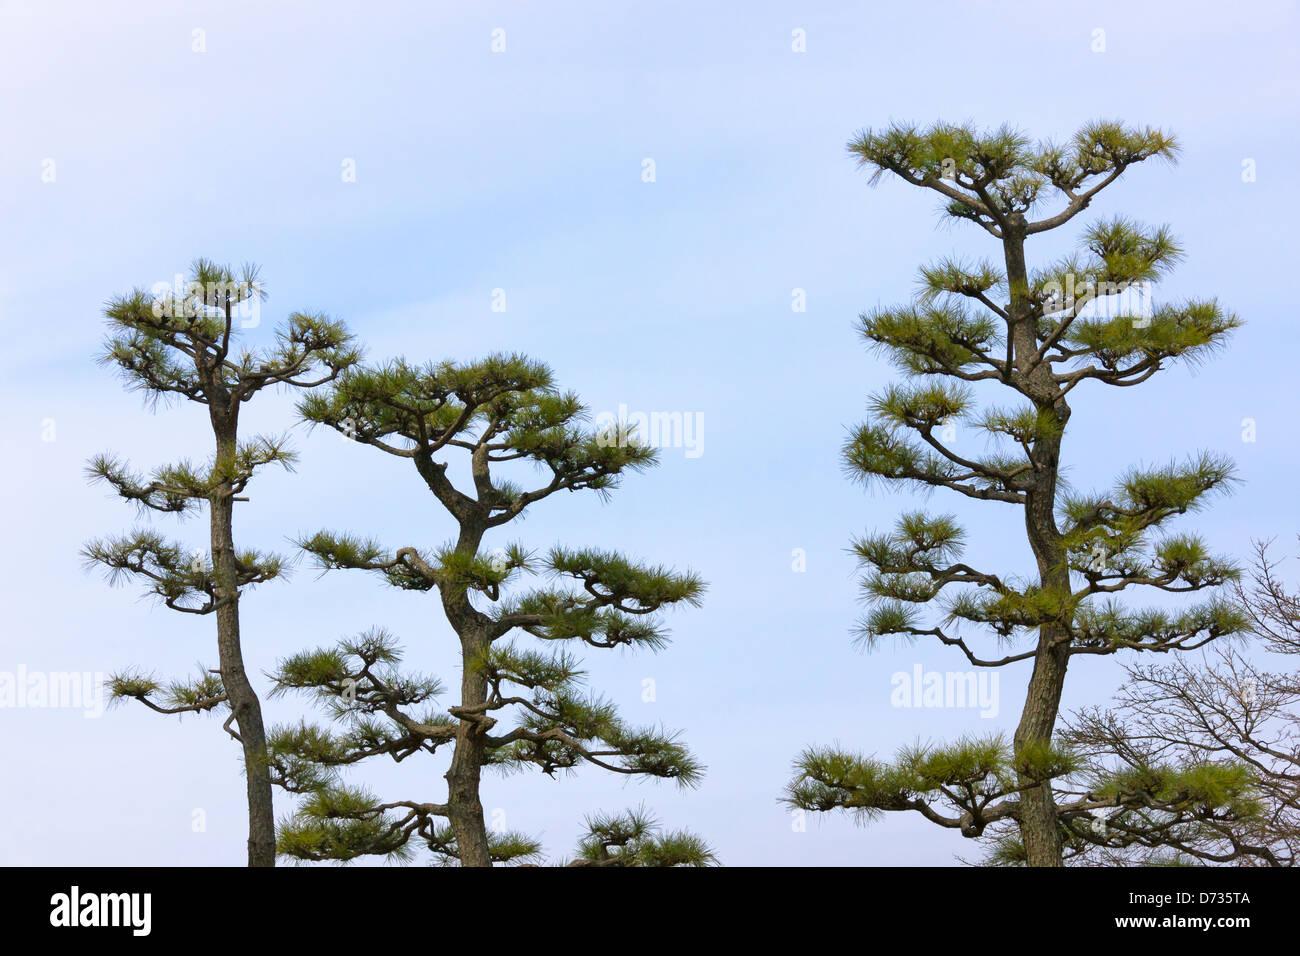 Well trimmed pine trees, Okayama, Japan - Stock Image